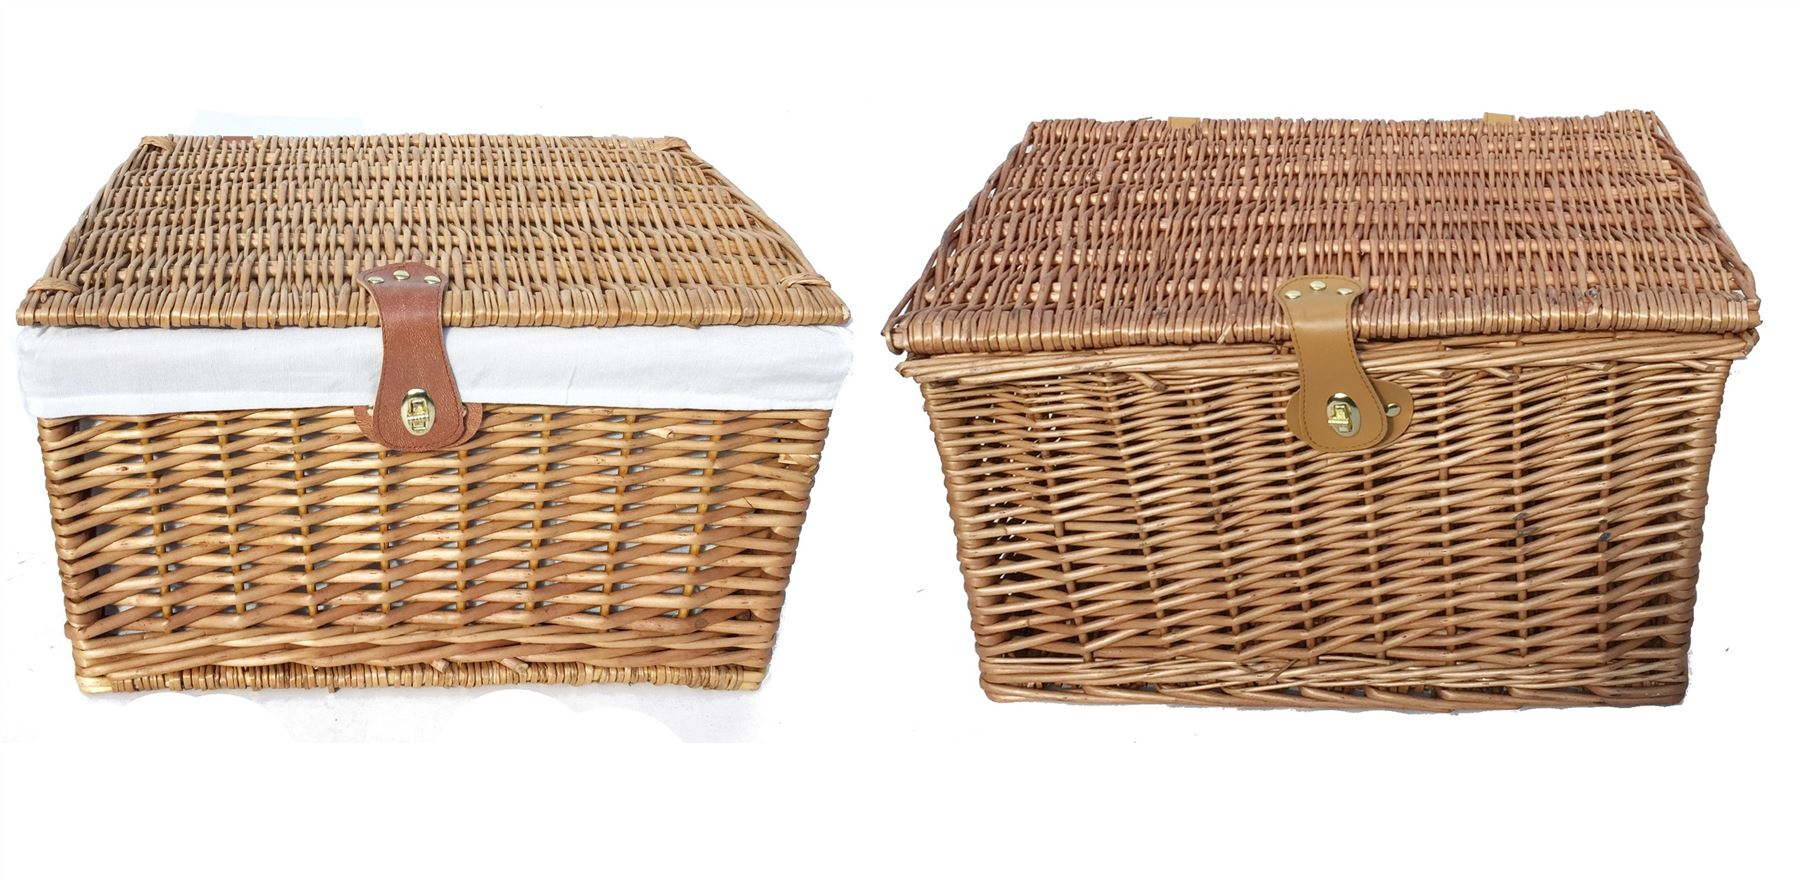 Picnic Basket Empty : Strong traditional picnic gift storage xmas christmas